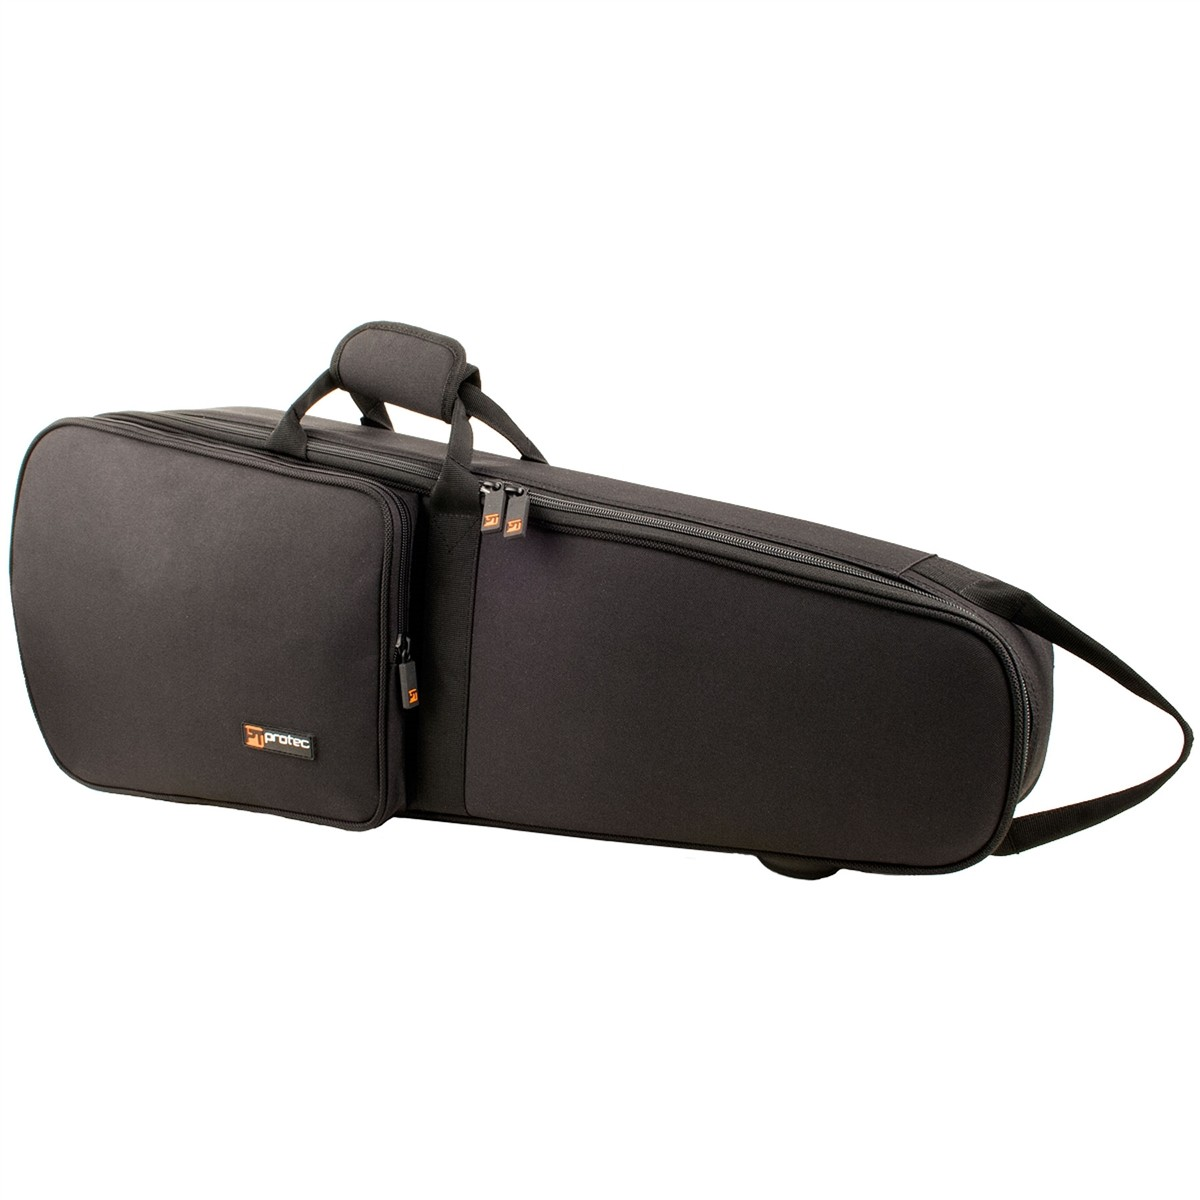 Protec Ukulele Gig Bag (Tenor) - Gold Series (CF218)